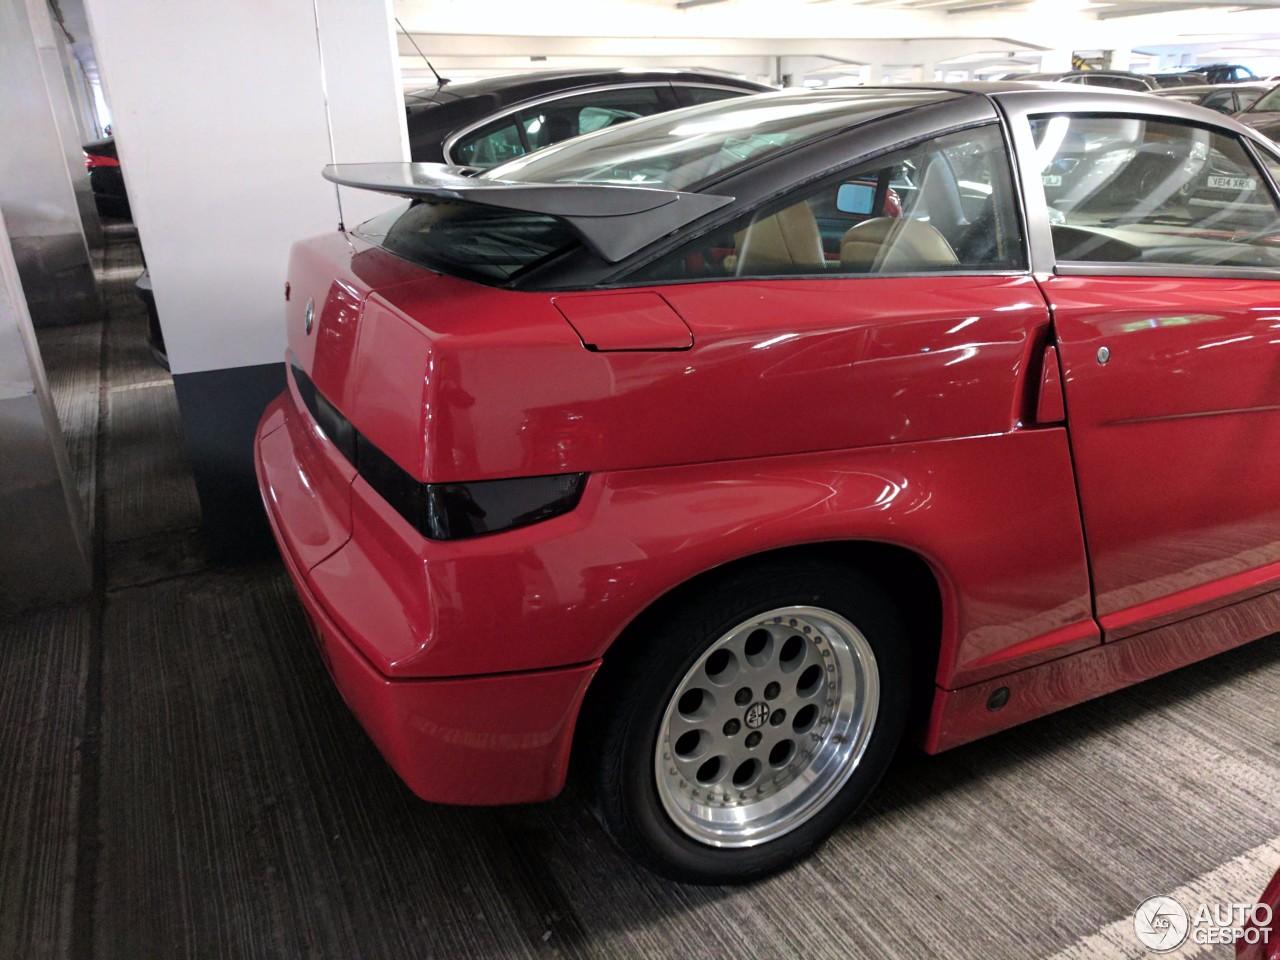 Alfa Romeo SZ - 7 June 2017 - Autogespot